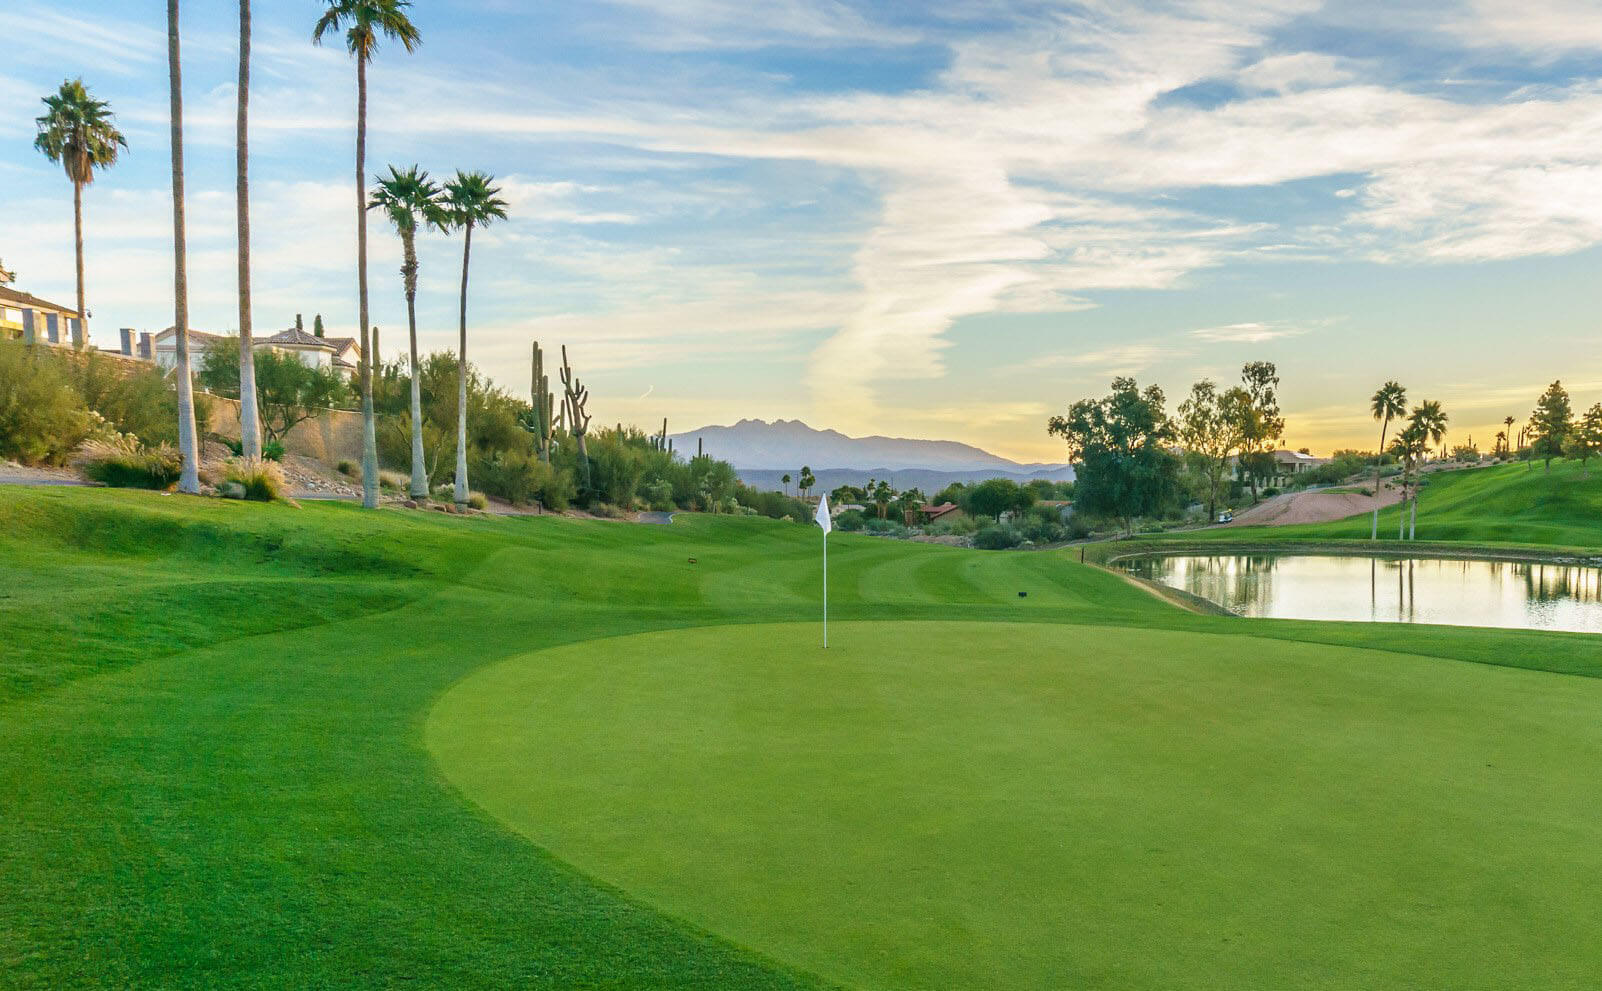 golf courses scottsdale arizona golfpac